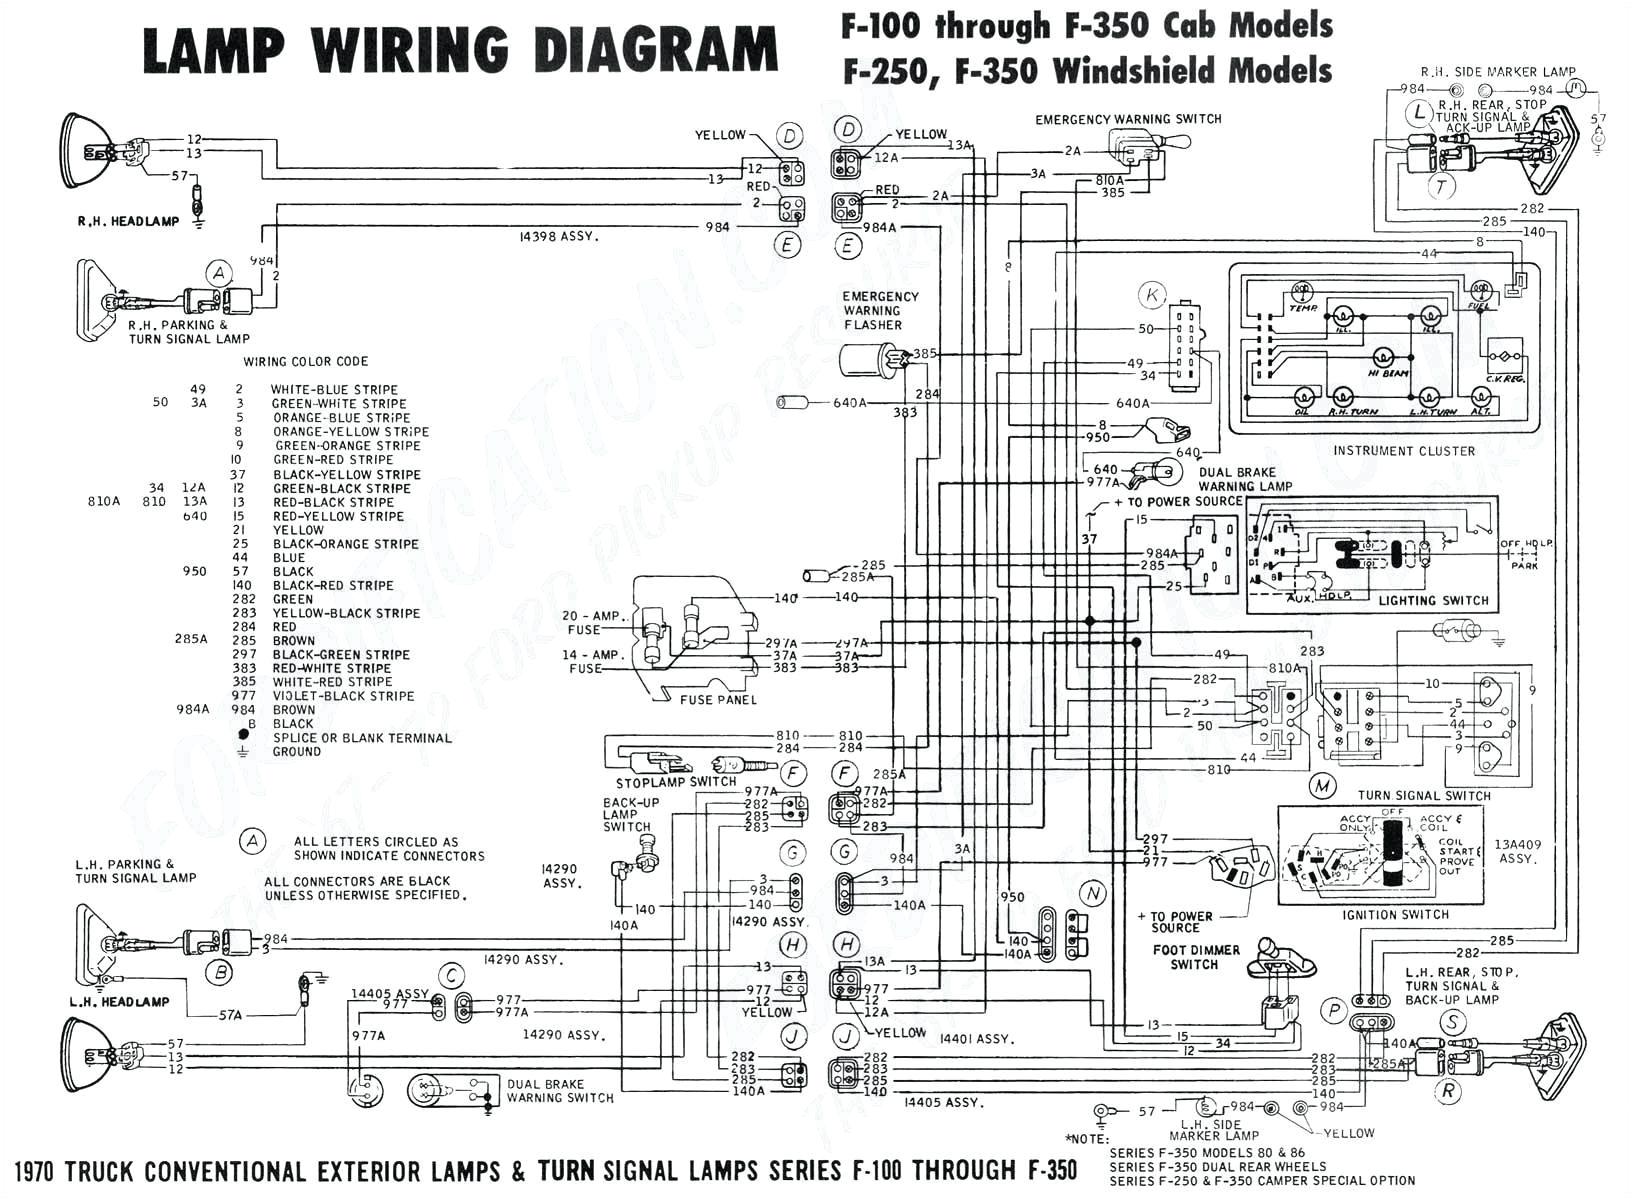 1998 chrysler wiring diagram wiring diagram 19961998 throttle position sensor circuit diagram dodge 39l 52l